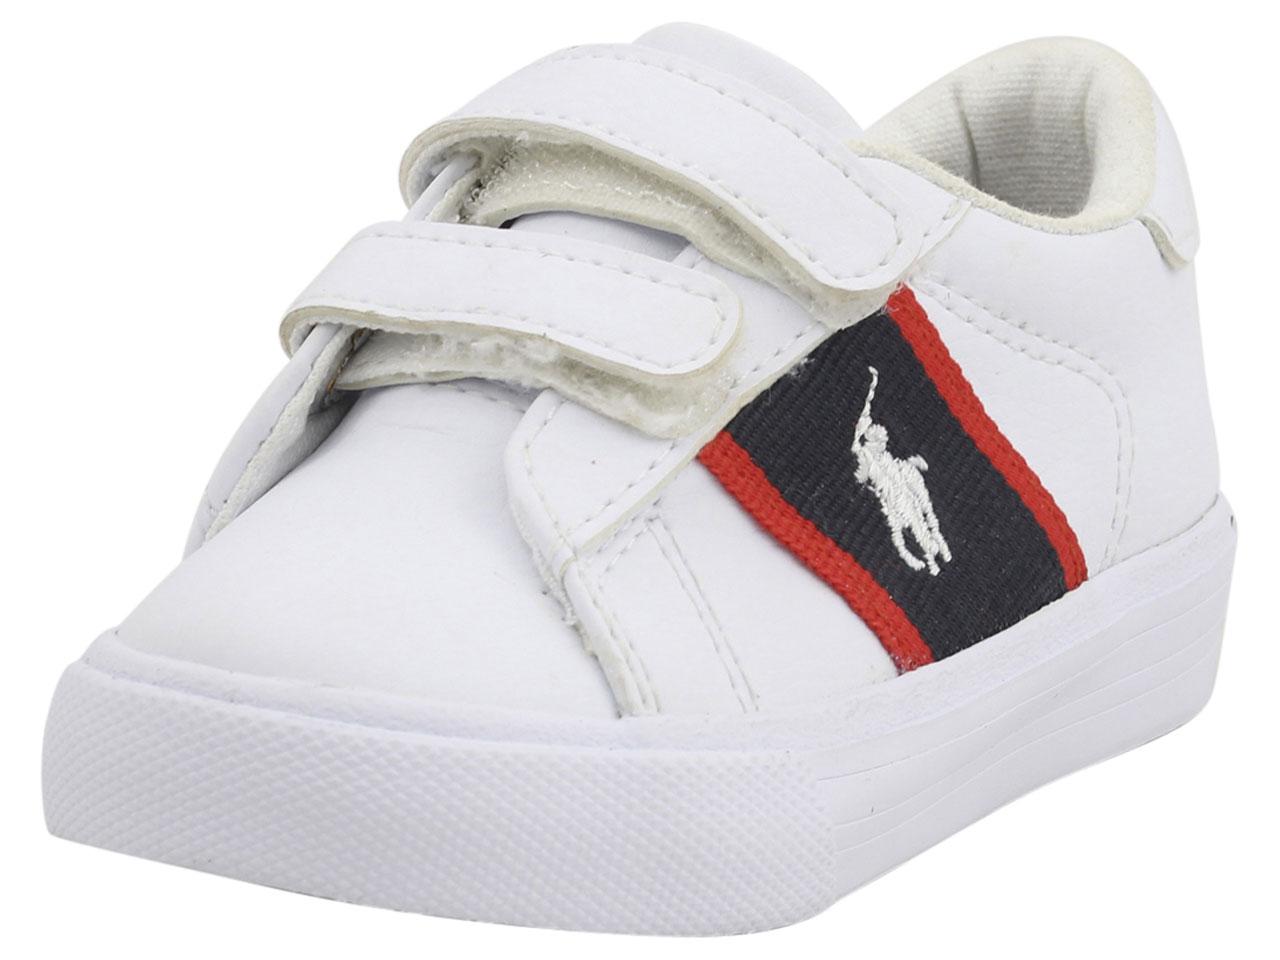 acbef1bc424b5 Polo Ralph Lauren Toddler Boy's Geoff-EZ White/Navy/Red Sneakers ...